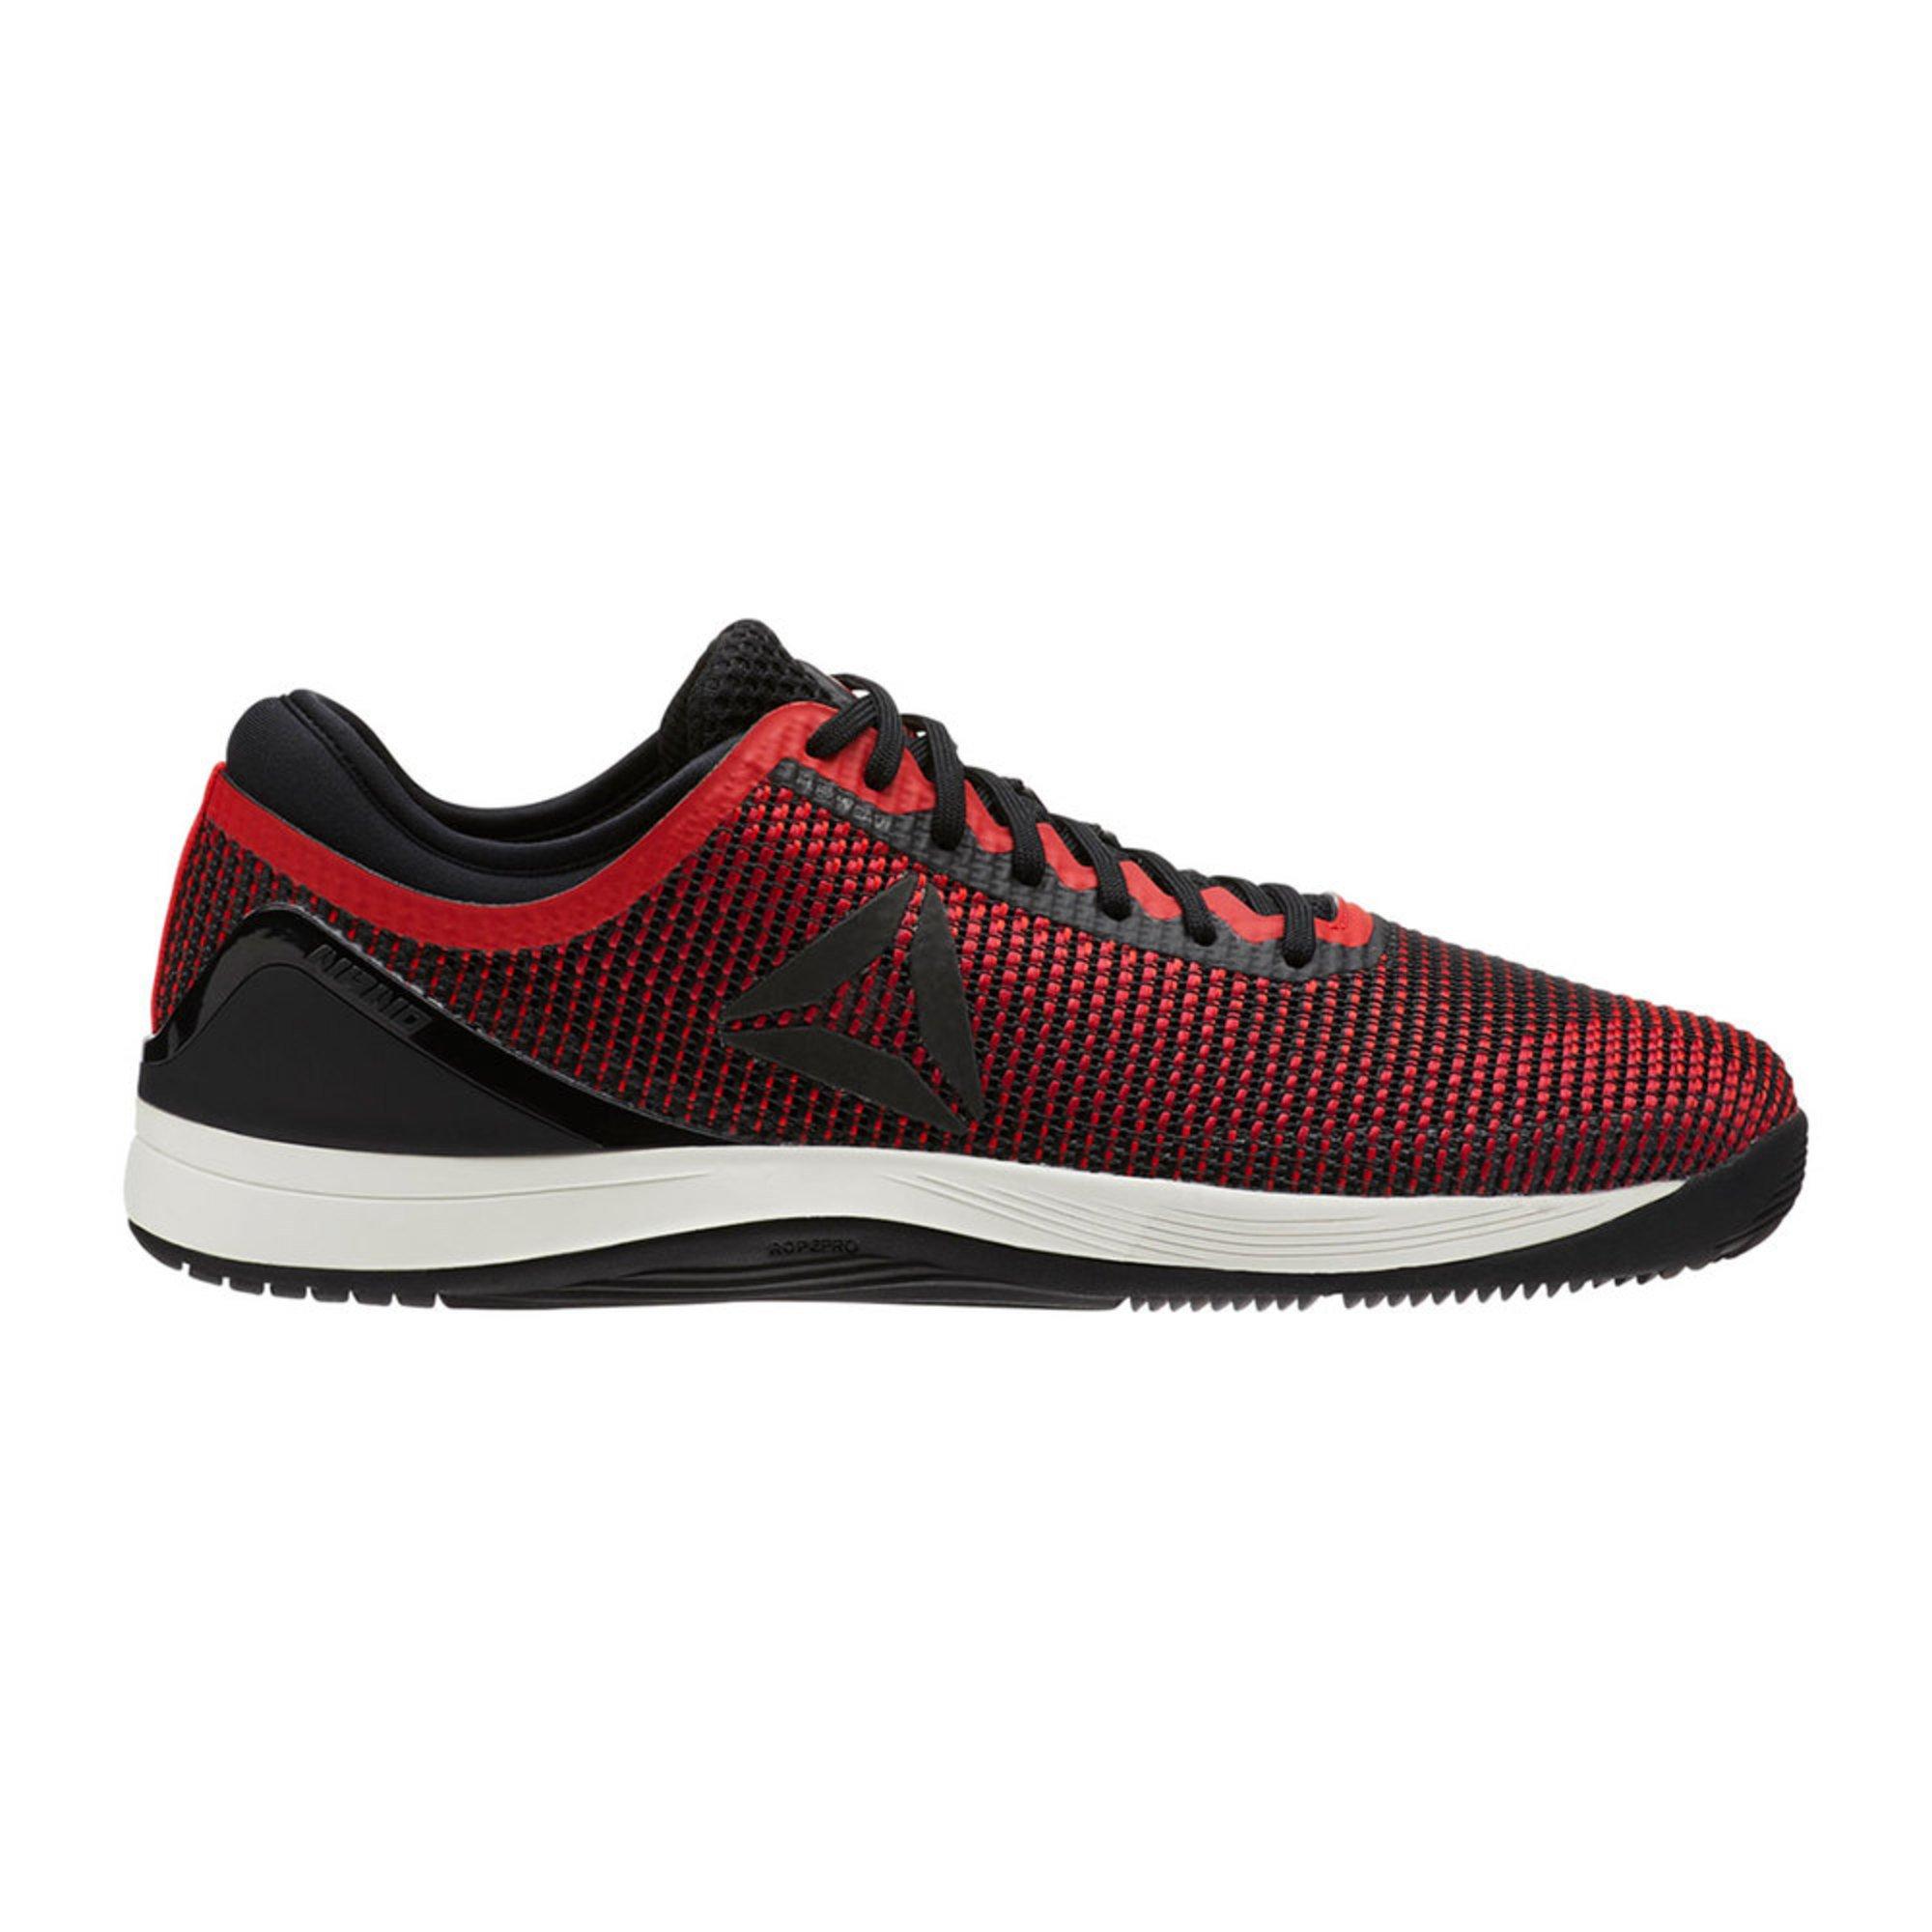 f0a405a76c0f Reebok Men s Crossfit Nano 8.0 Crossfit Training Shoe